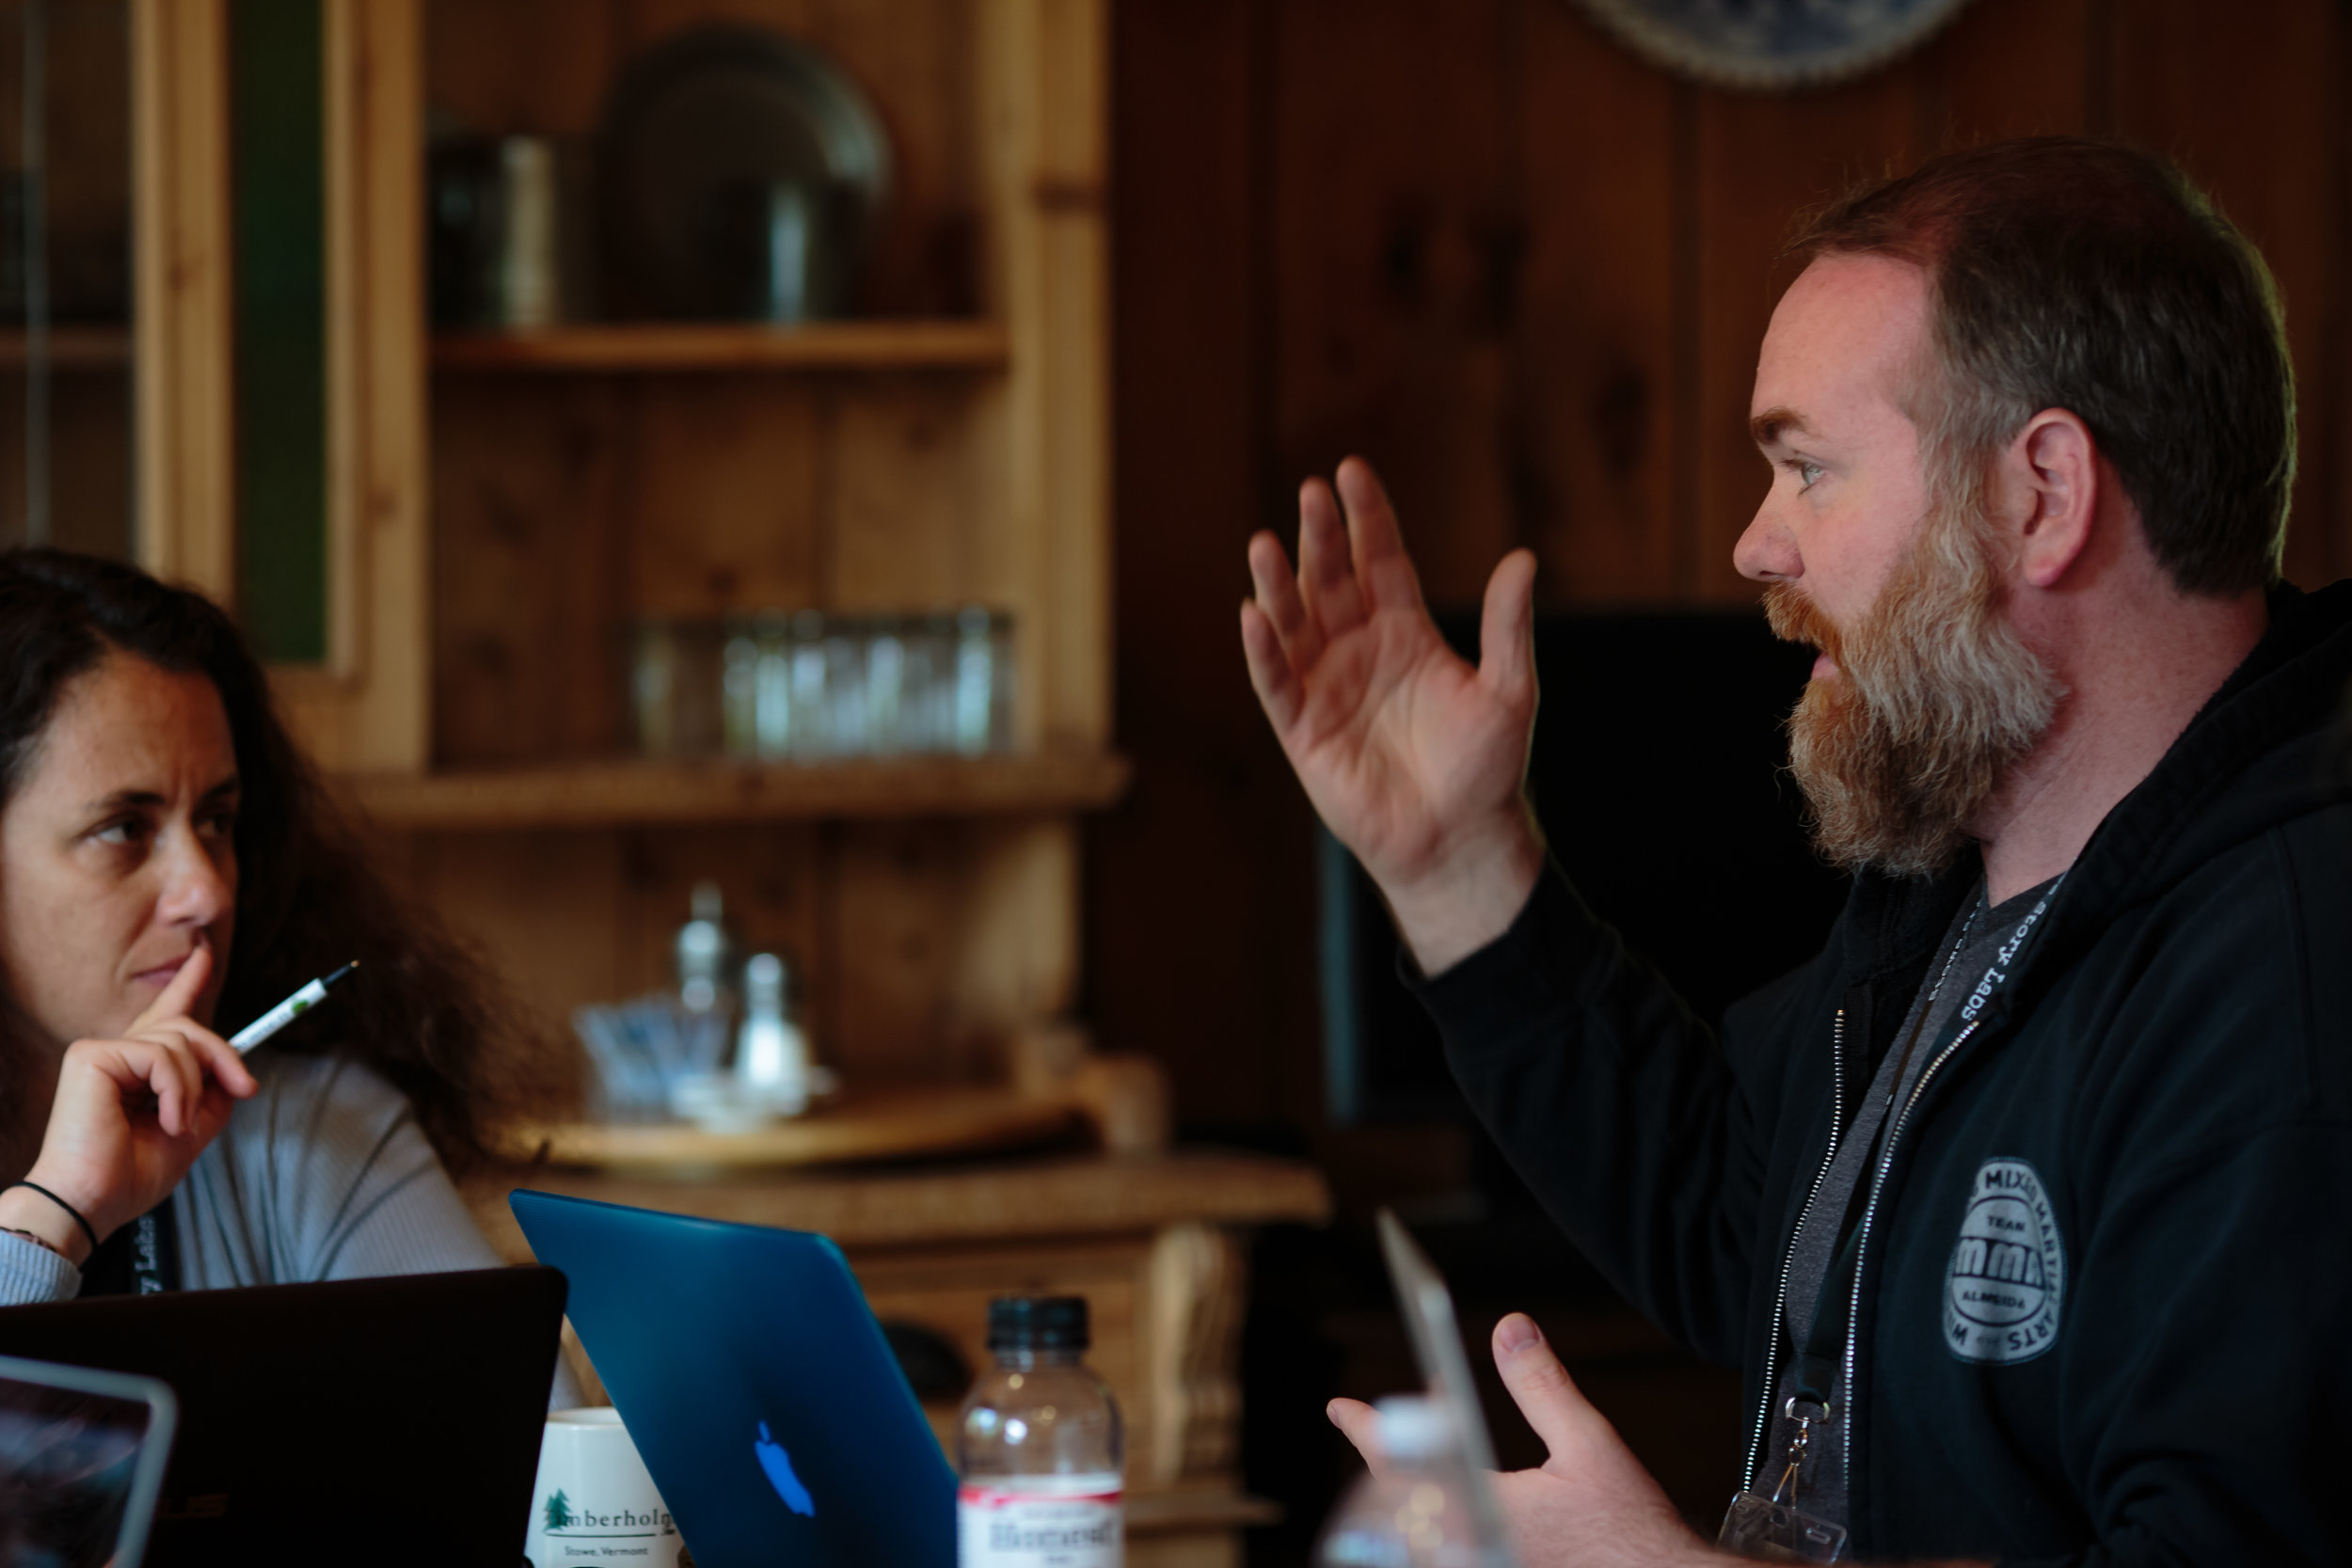 Nelson Downend and Shoshana Rosenbaum at 2017 Writers' Retreat, Timberholm Inn